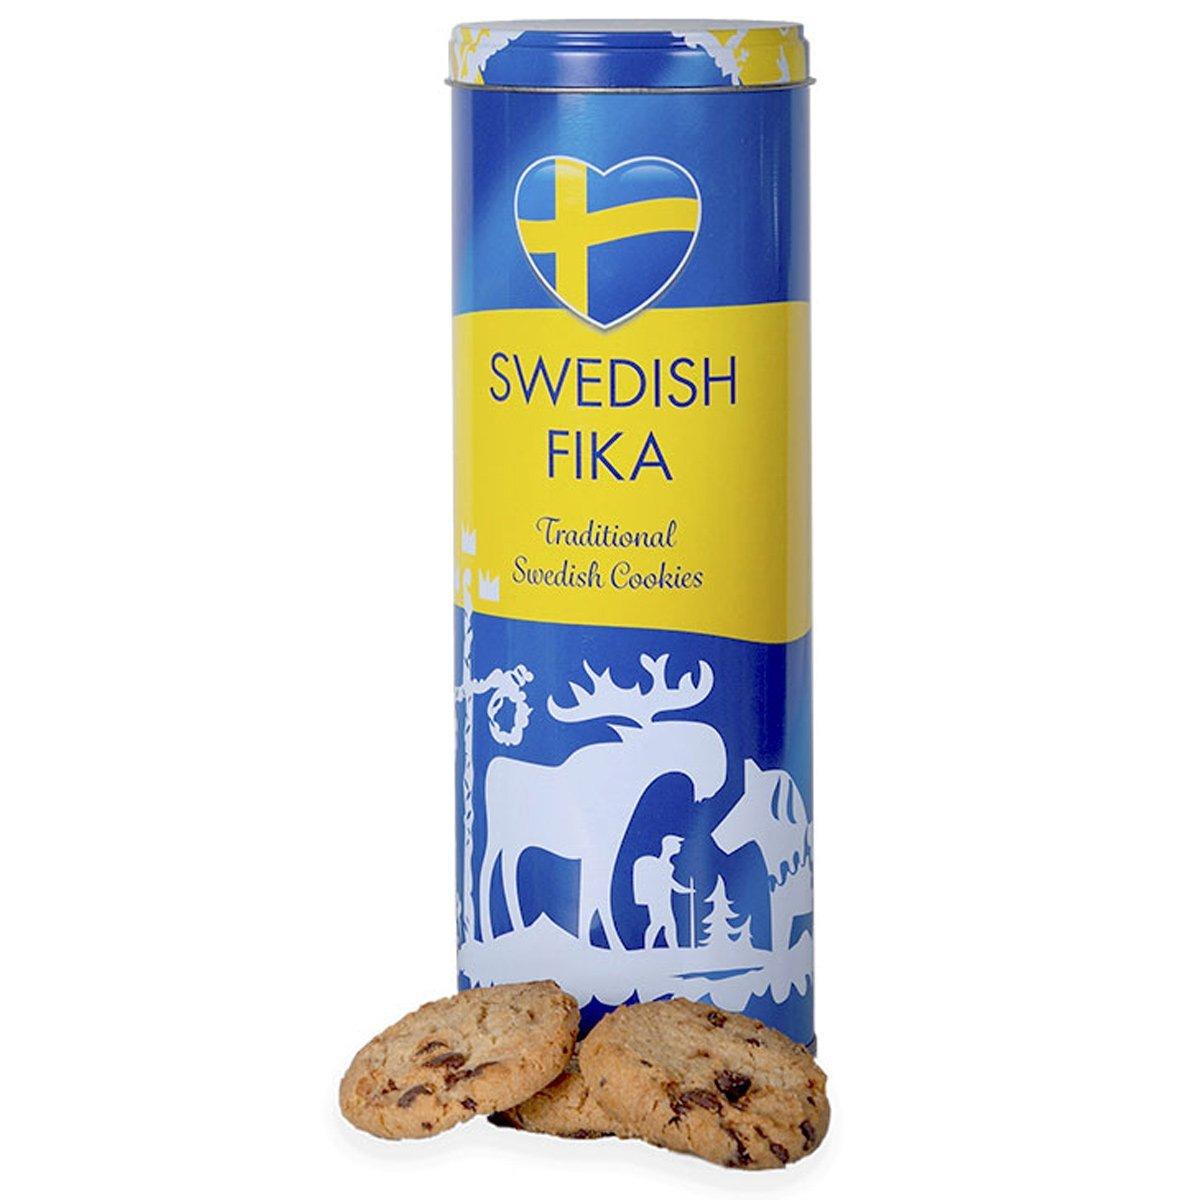 Swedish Fika Traditional Cookies - Chokladkakor (160g) 1